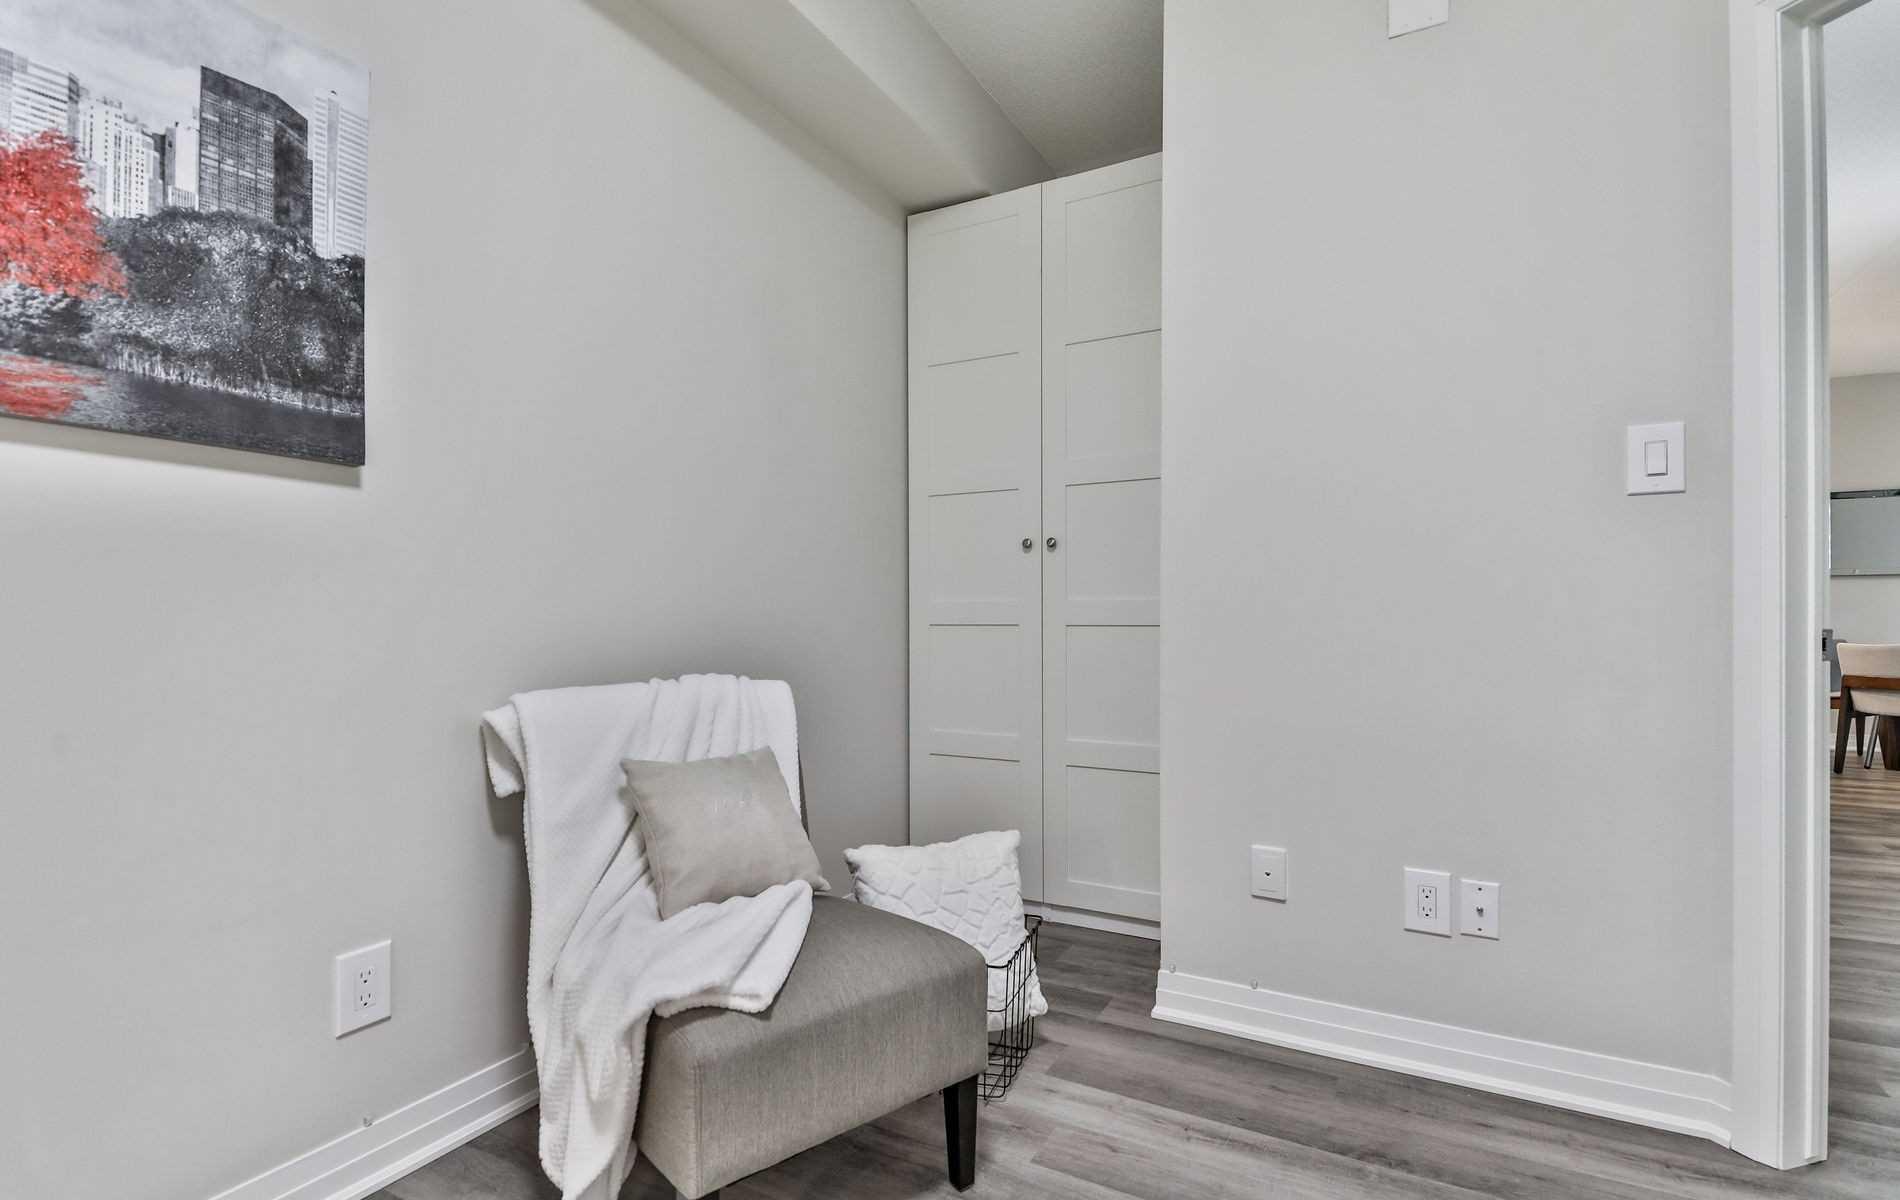 316 - 610 Farmstead Dr - Willmont Condo Apt for sale, 2 Bedrooms (W5399854) - #20